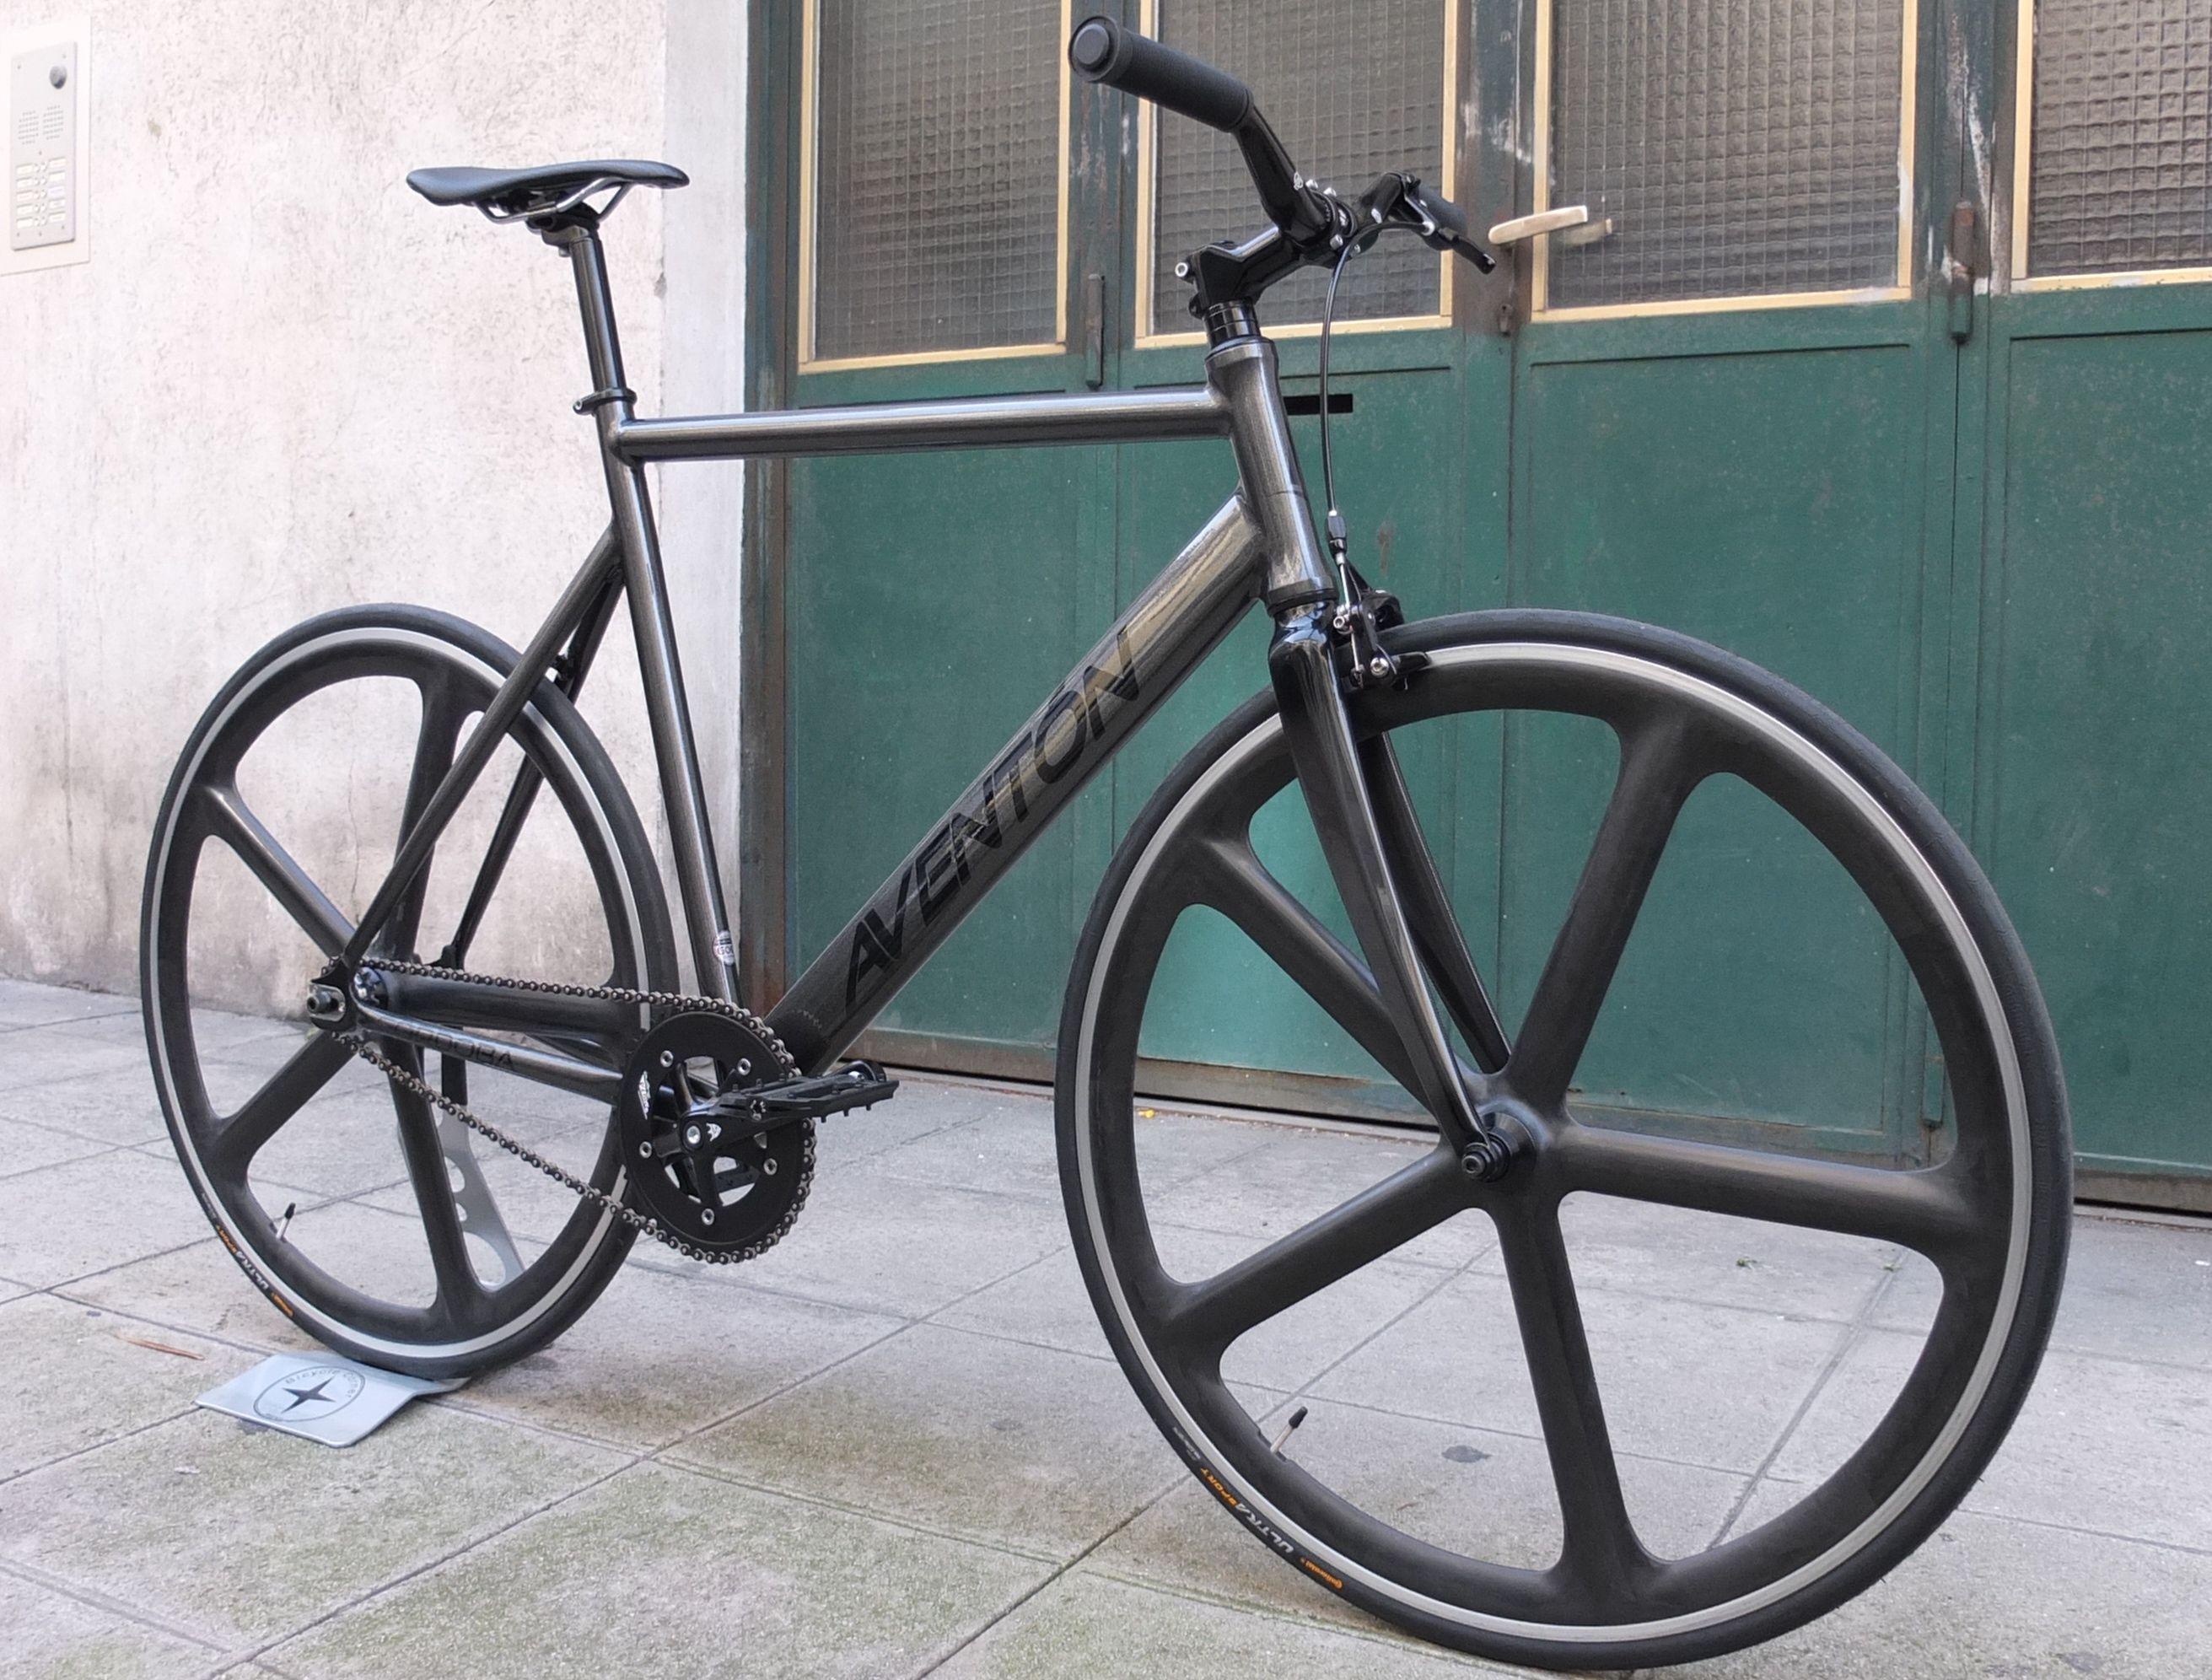 Montage fixie by Bicycle Corner sur cadre Aventon Cordoba, roues Aerospoke #fixedgear #fixie #bicycle #trackbike #Nice #singlespeed #fixed #pignon fixe #bicyclette #vélo #roue libre #Aventon #Cordoba #Aerospoke